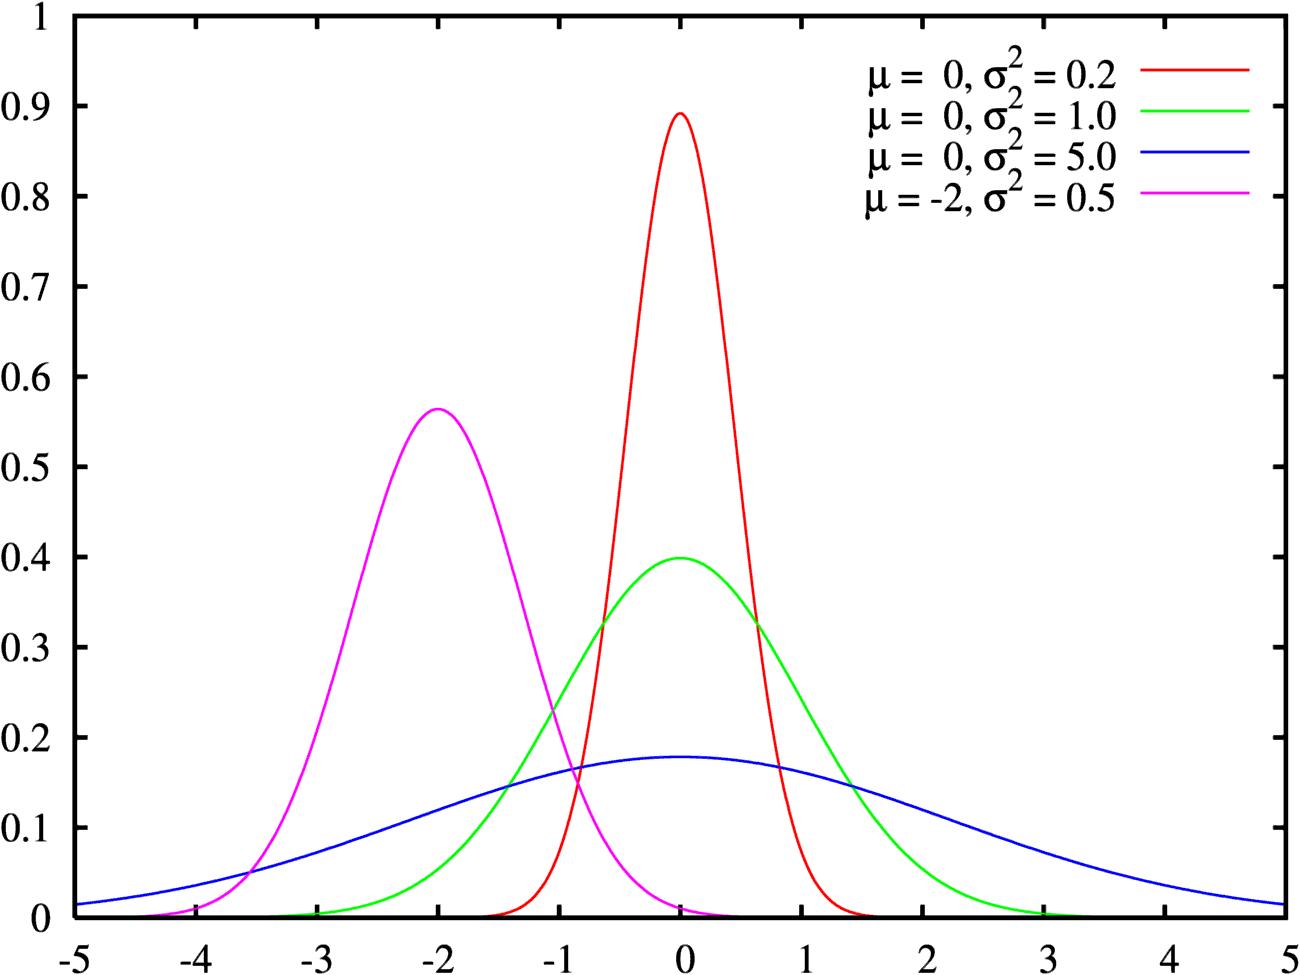 Normal_distribution_pdf.png